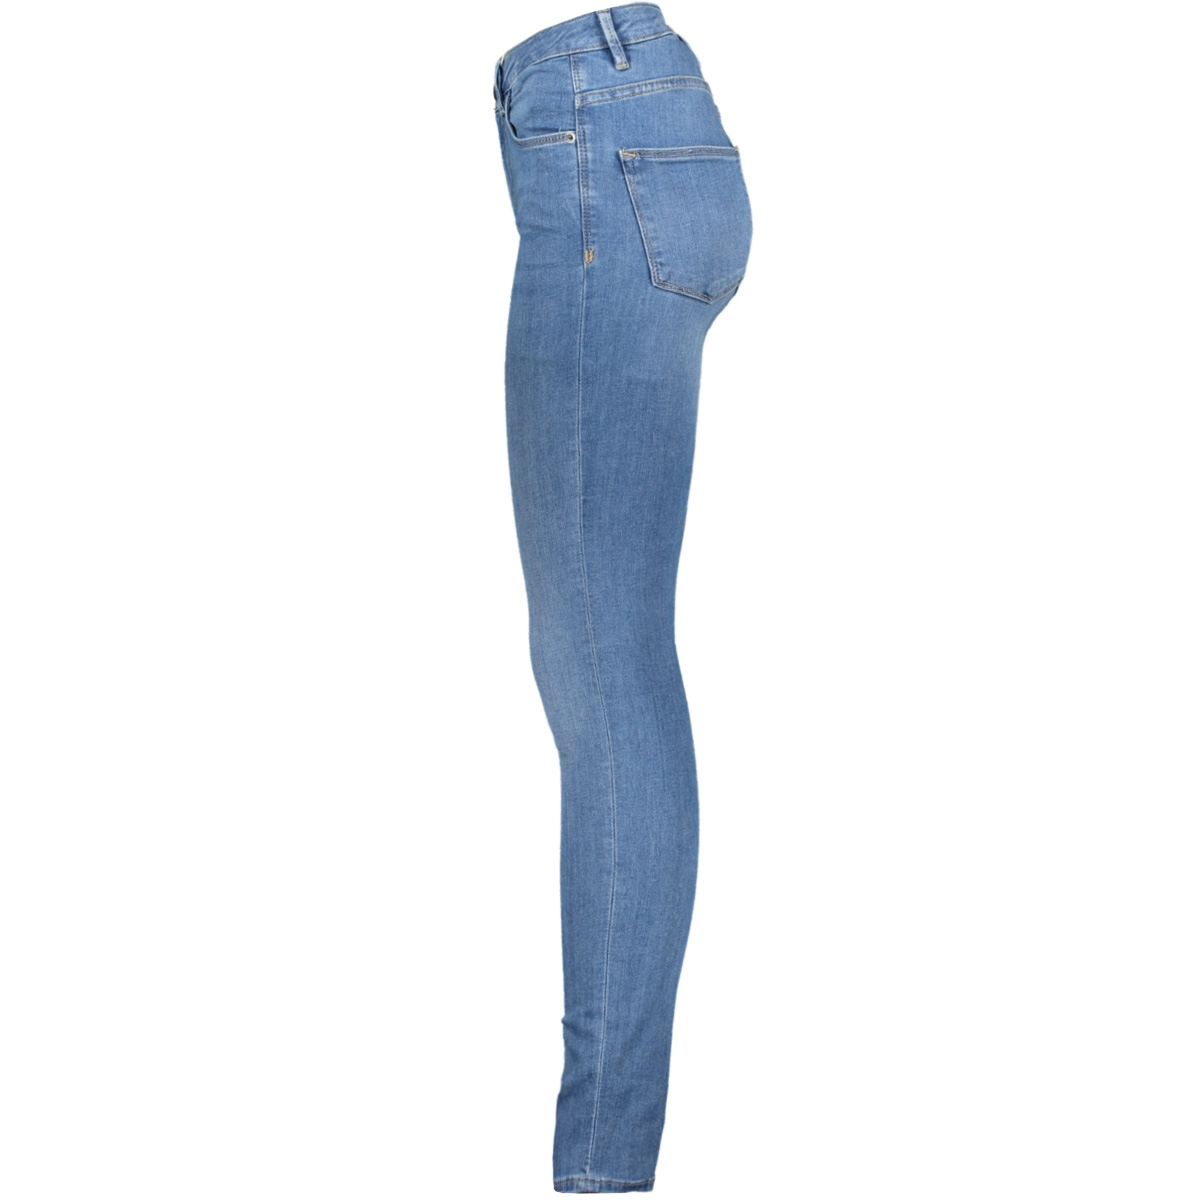 enrica 200 garcia jeans 5590 flow denim medium used